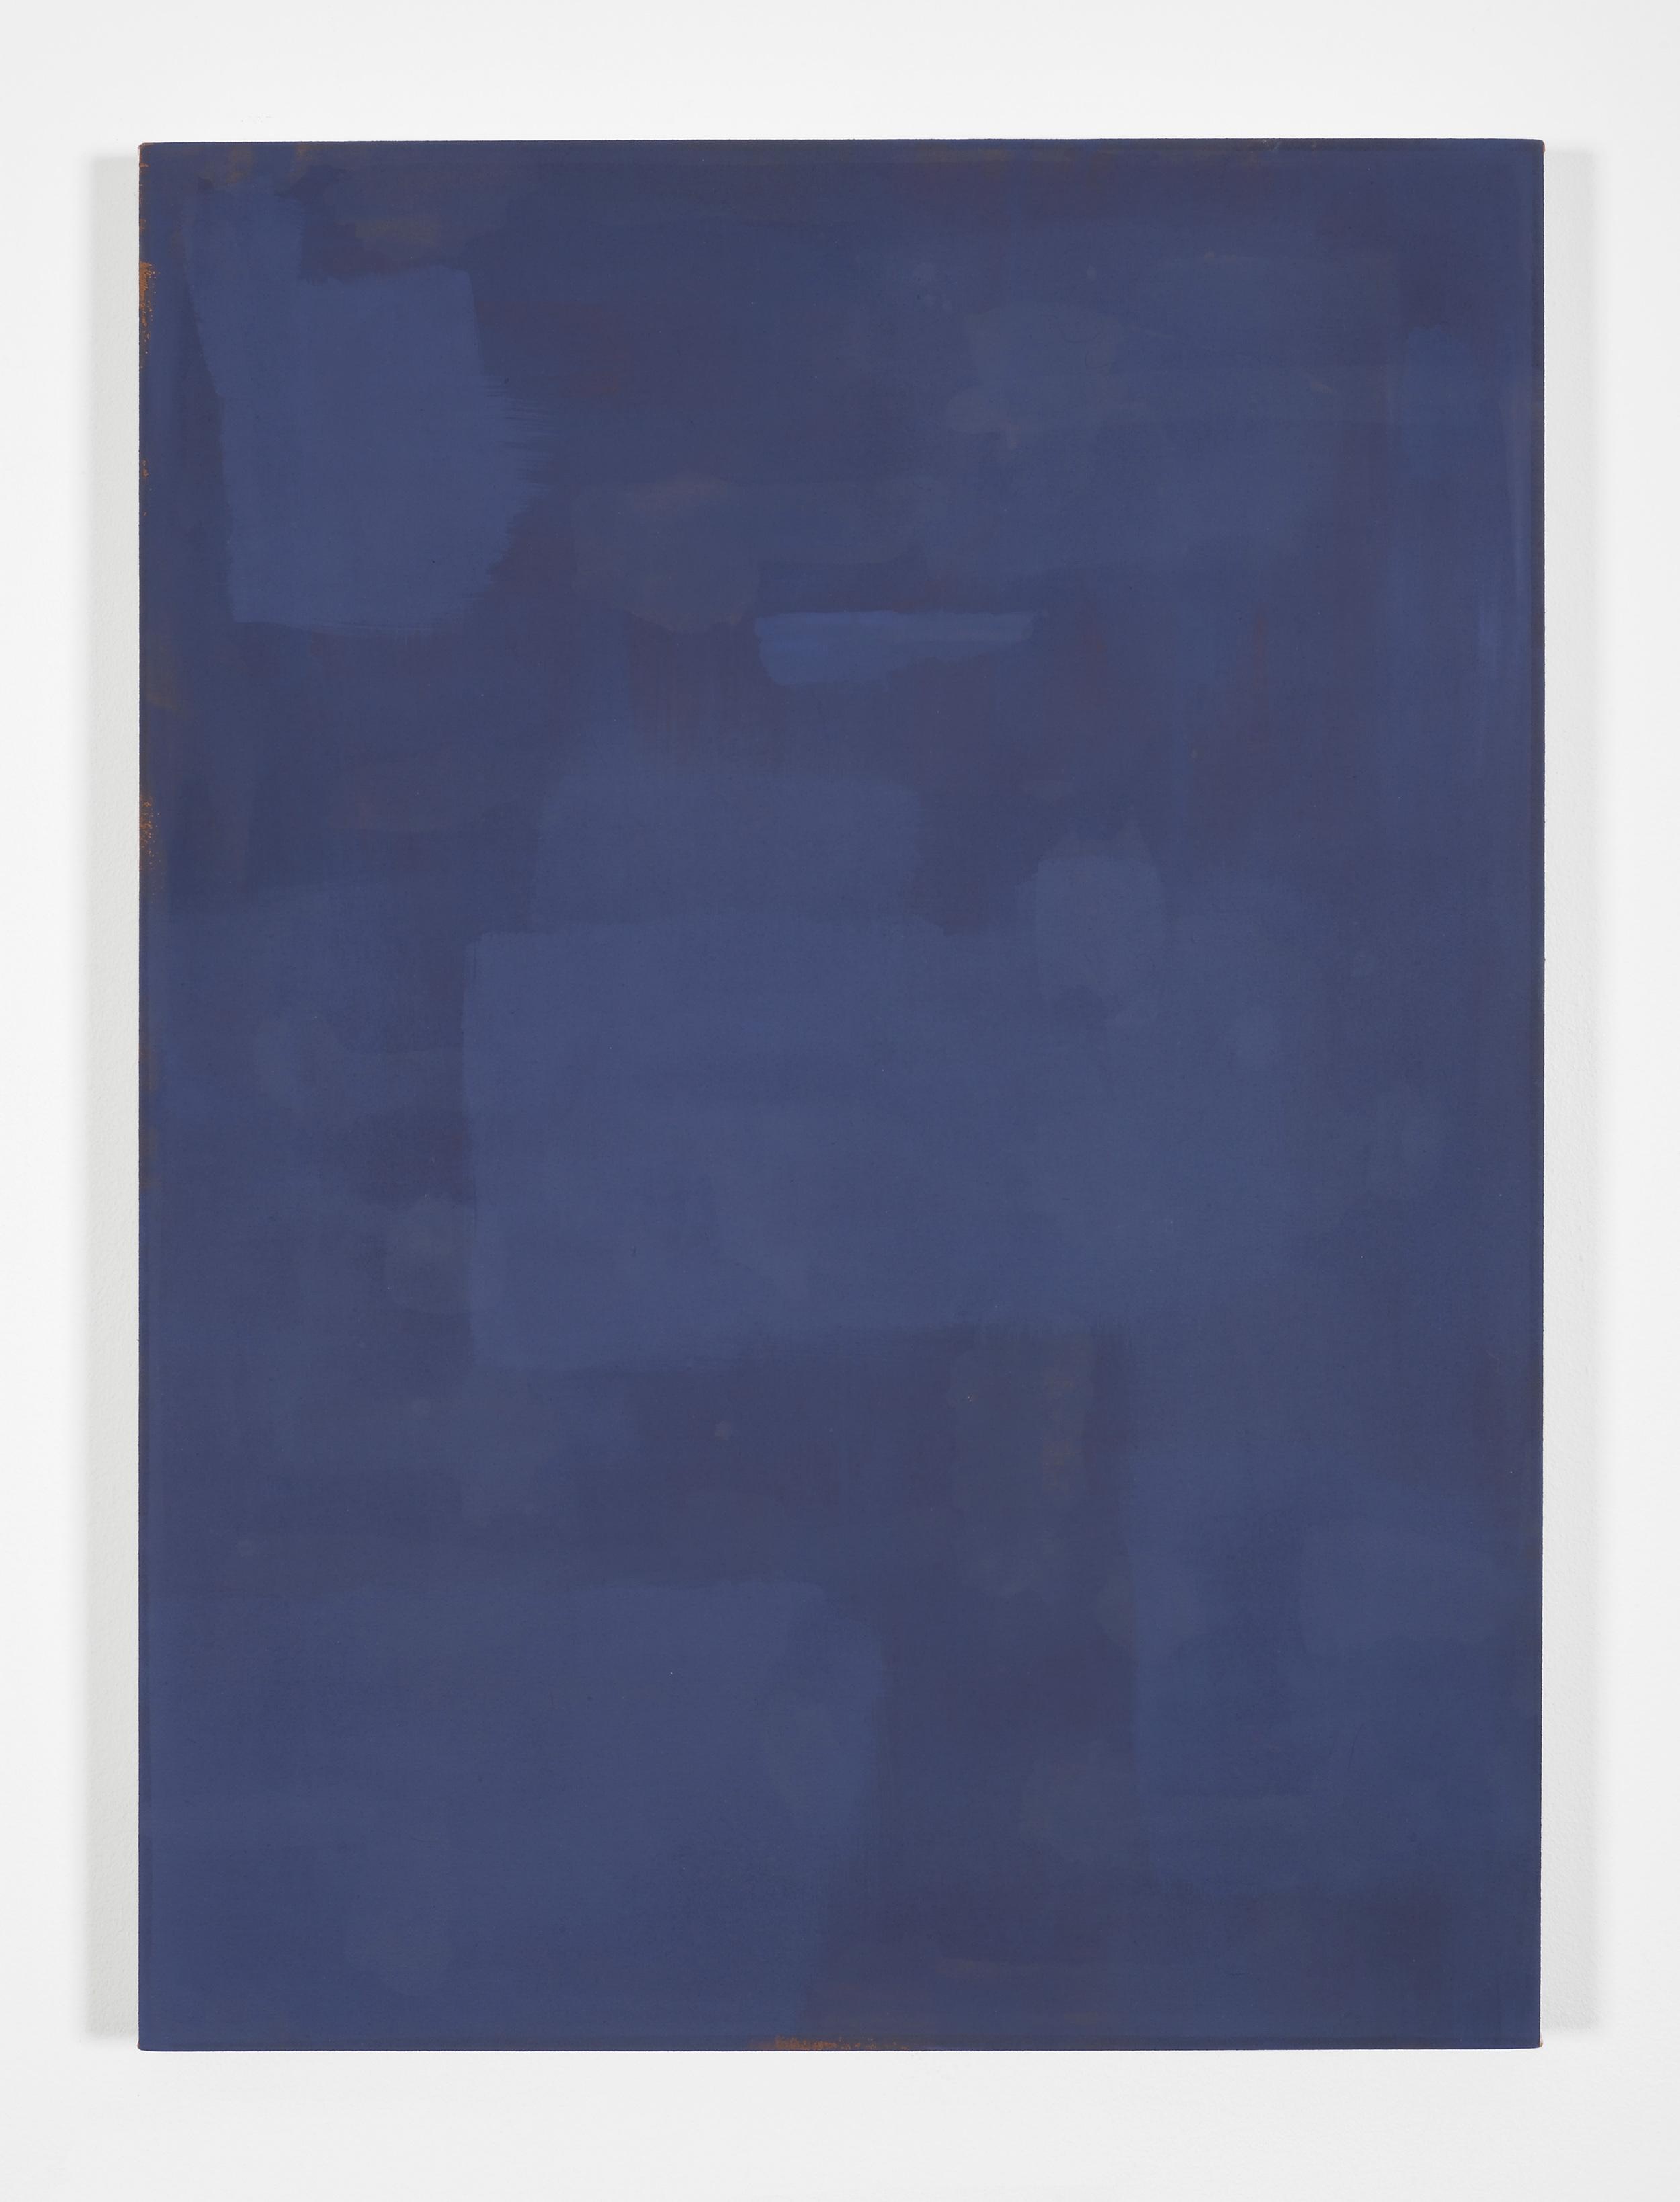 Matt Connors Progressive Corrections 2012 Acrylic on canvas 86 x 64 cm / 34 x 25 in